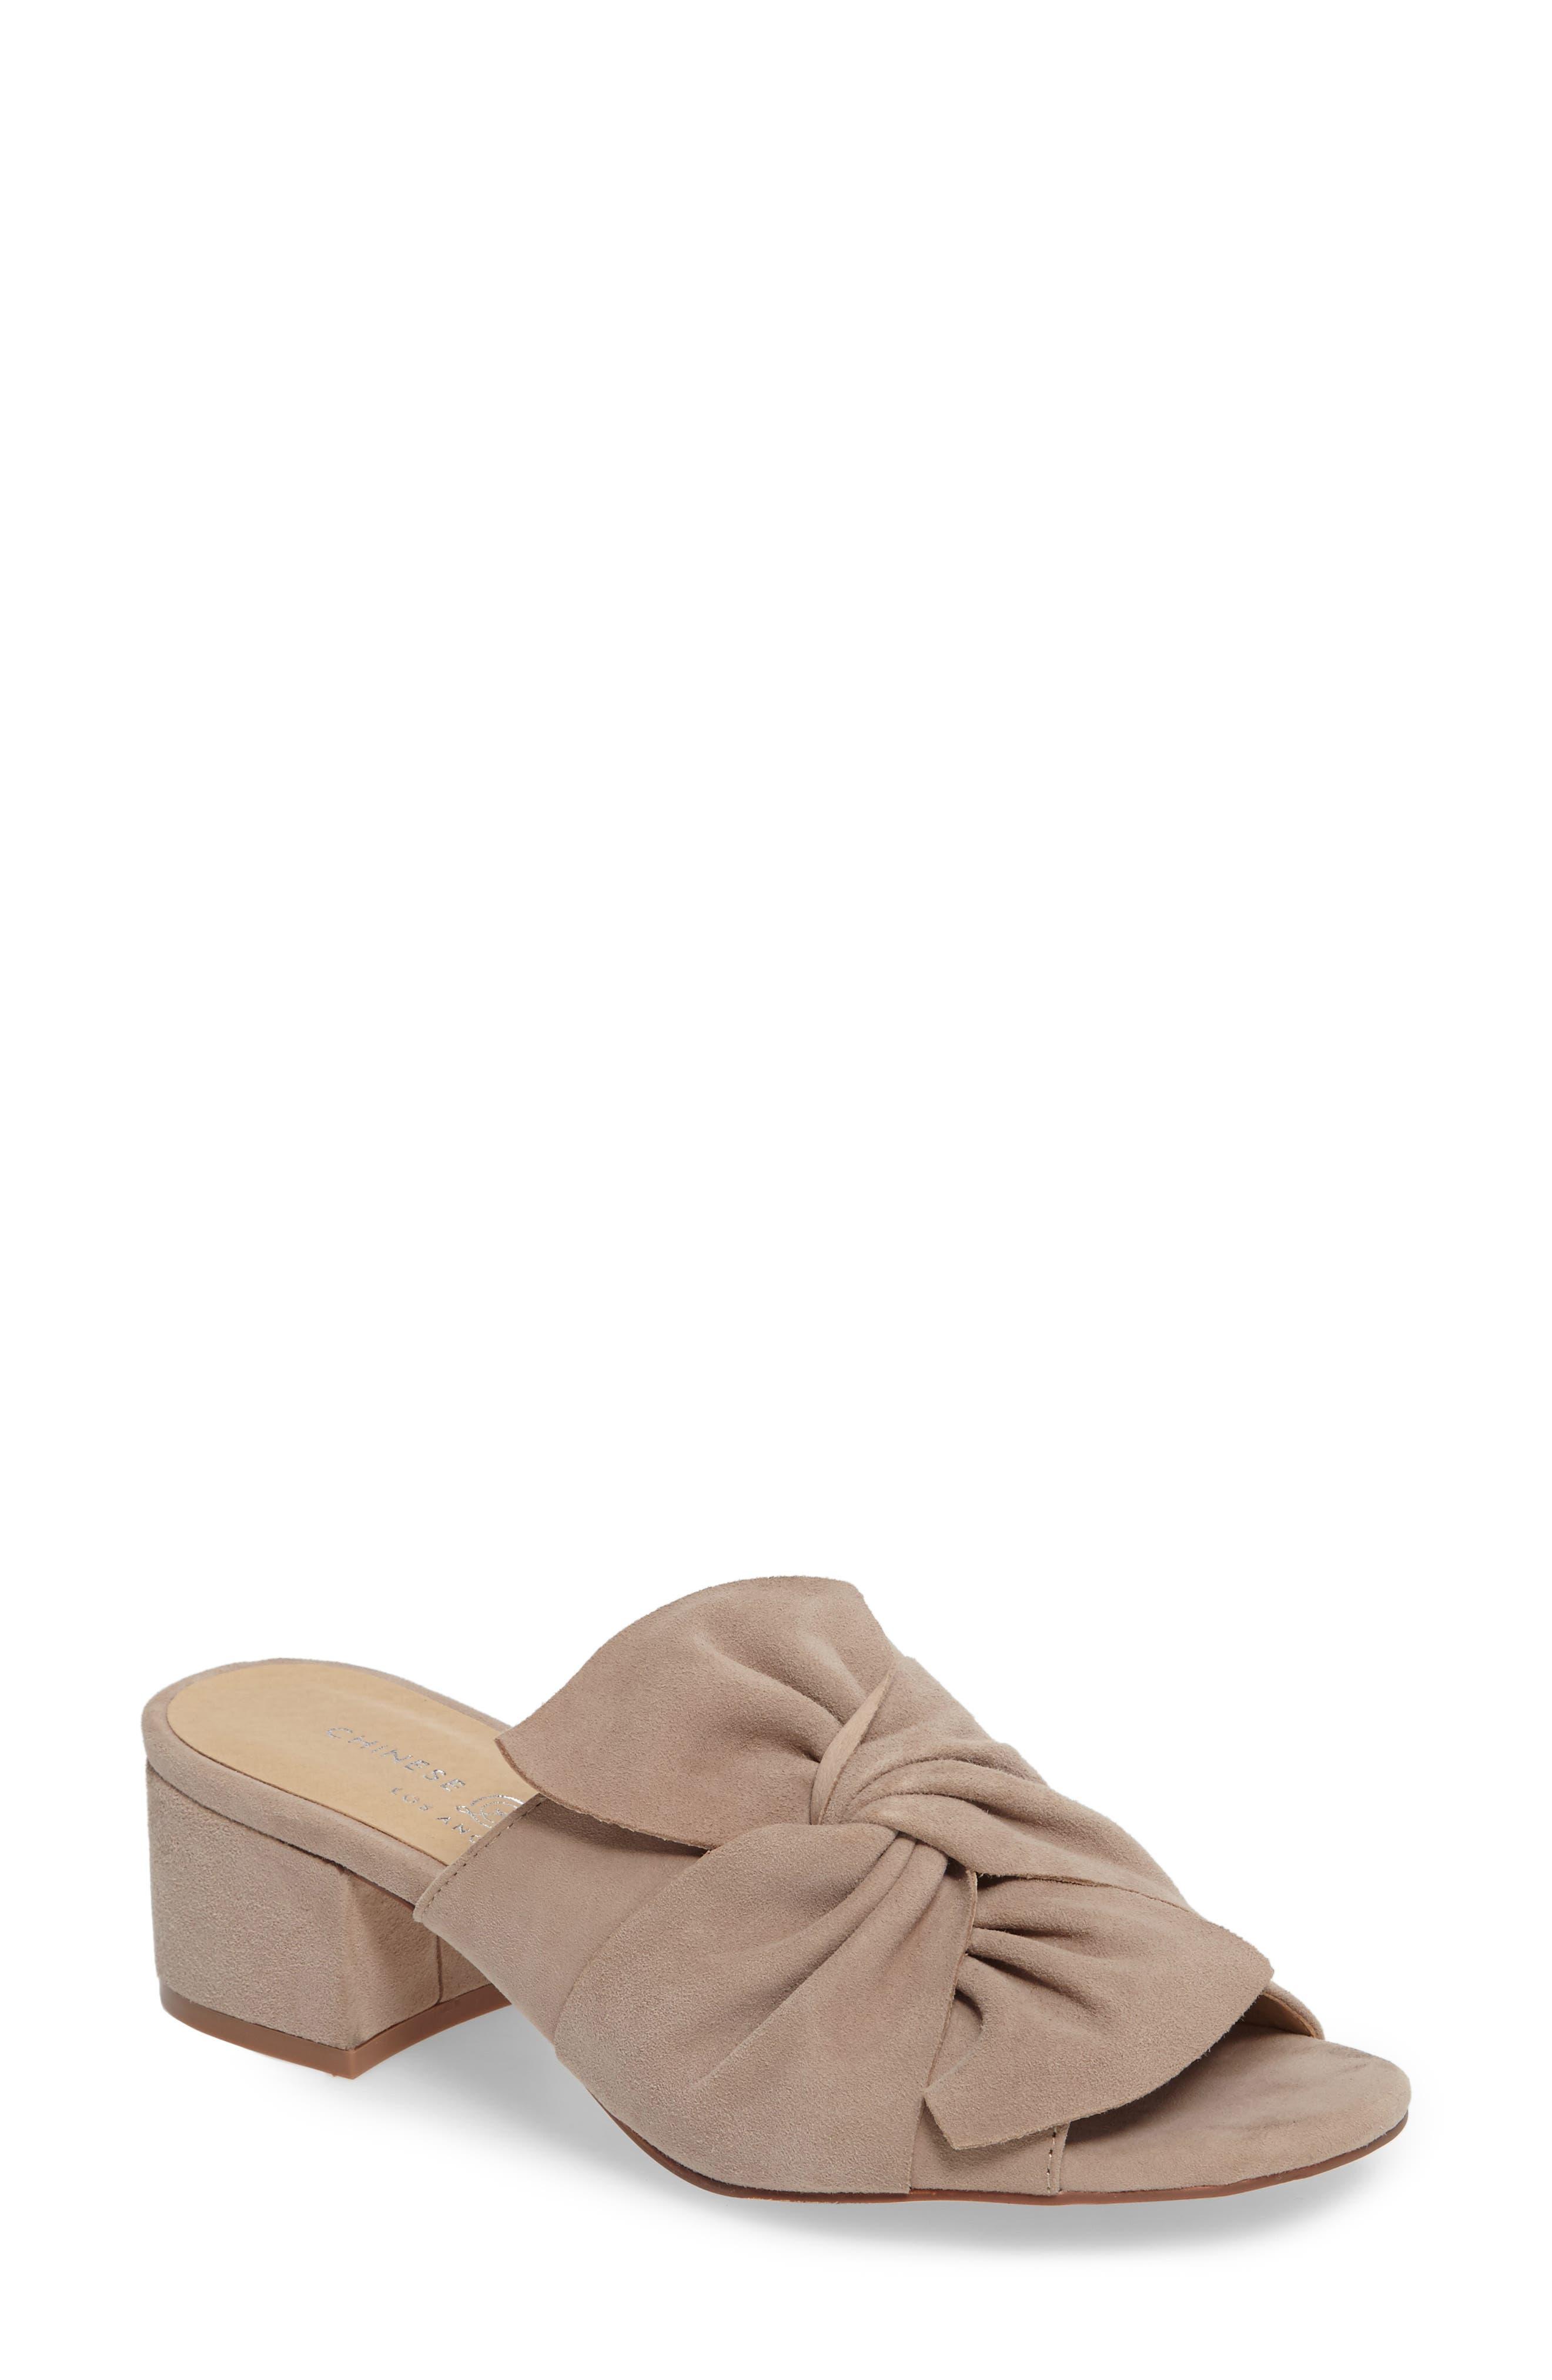 Chinese Laundry Marlowe Slide Sandal (Women)